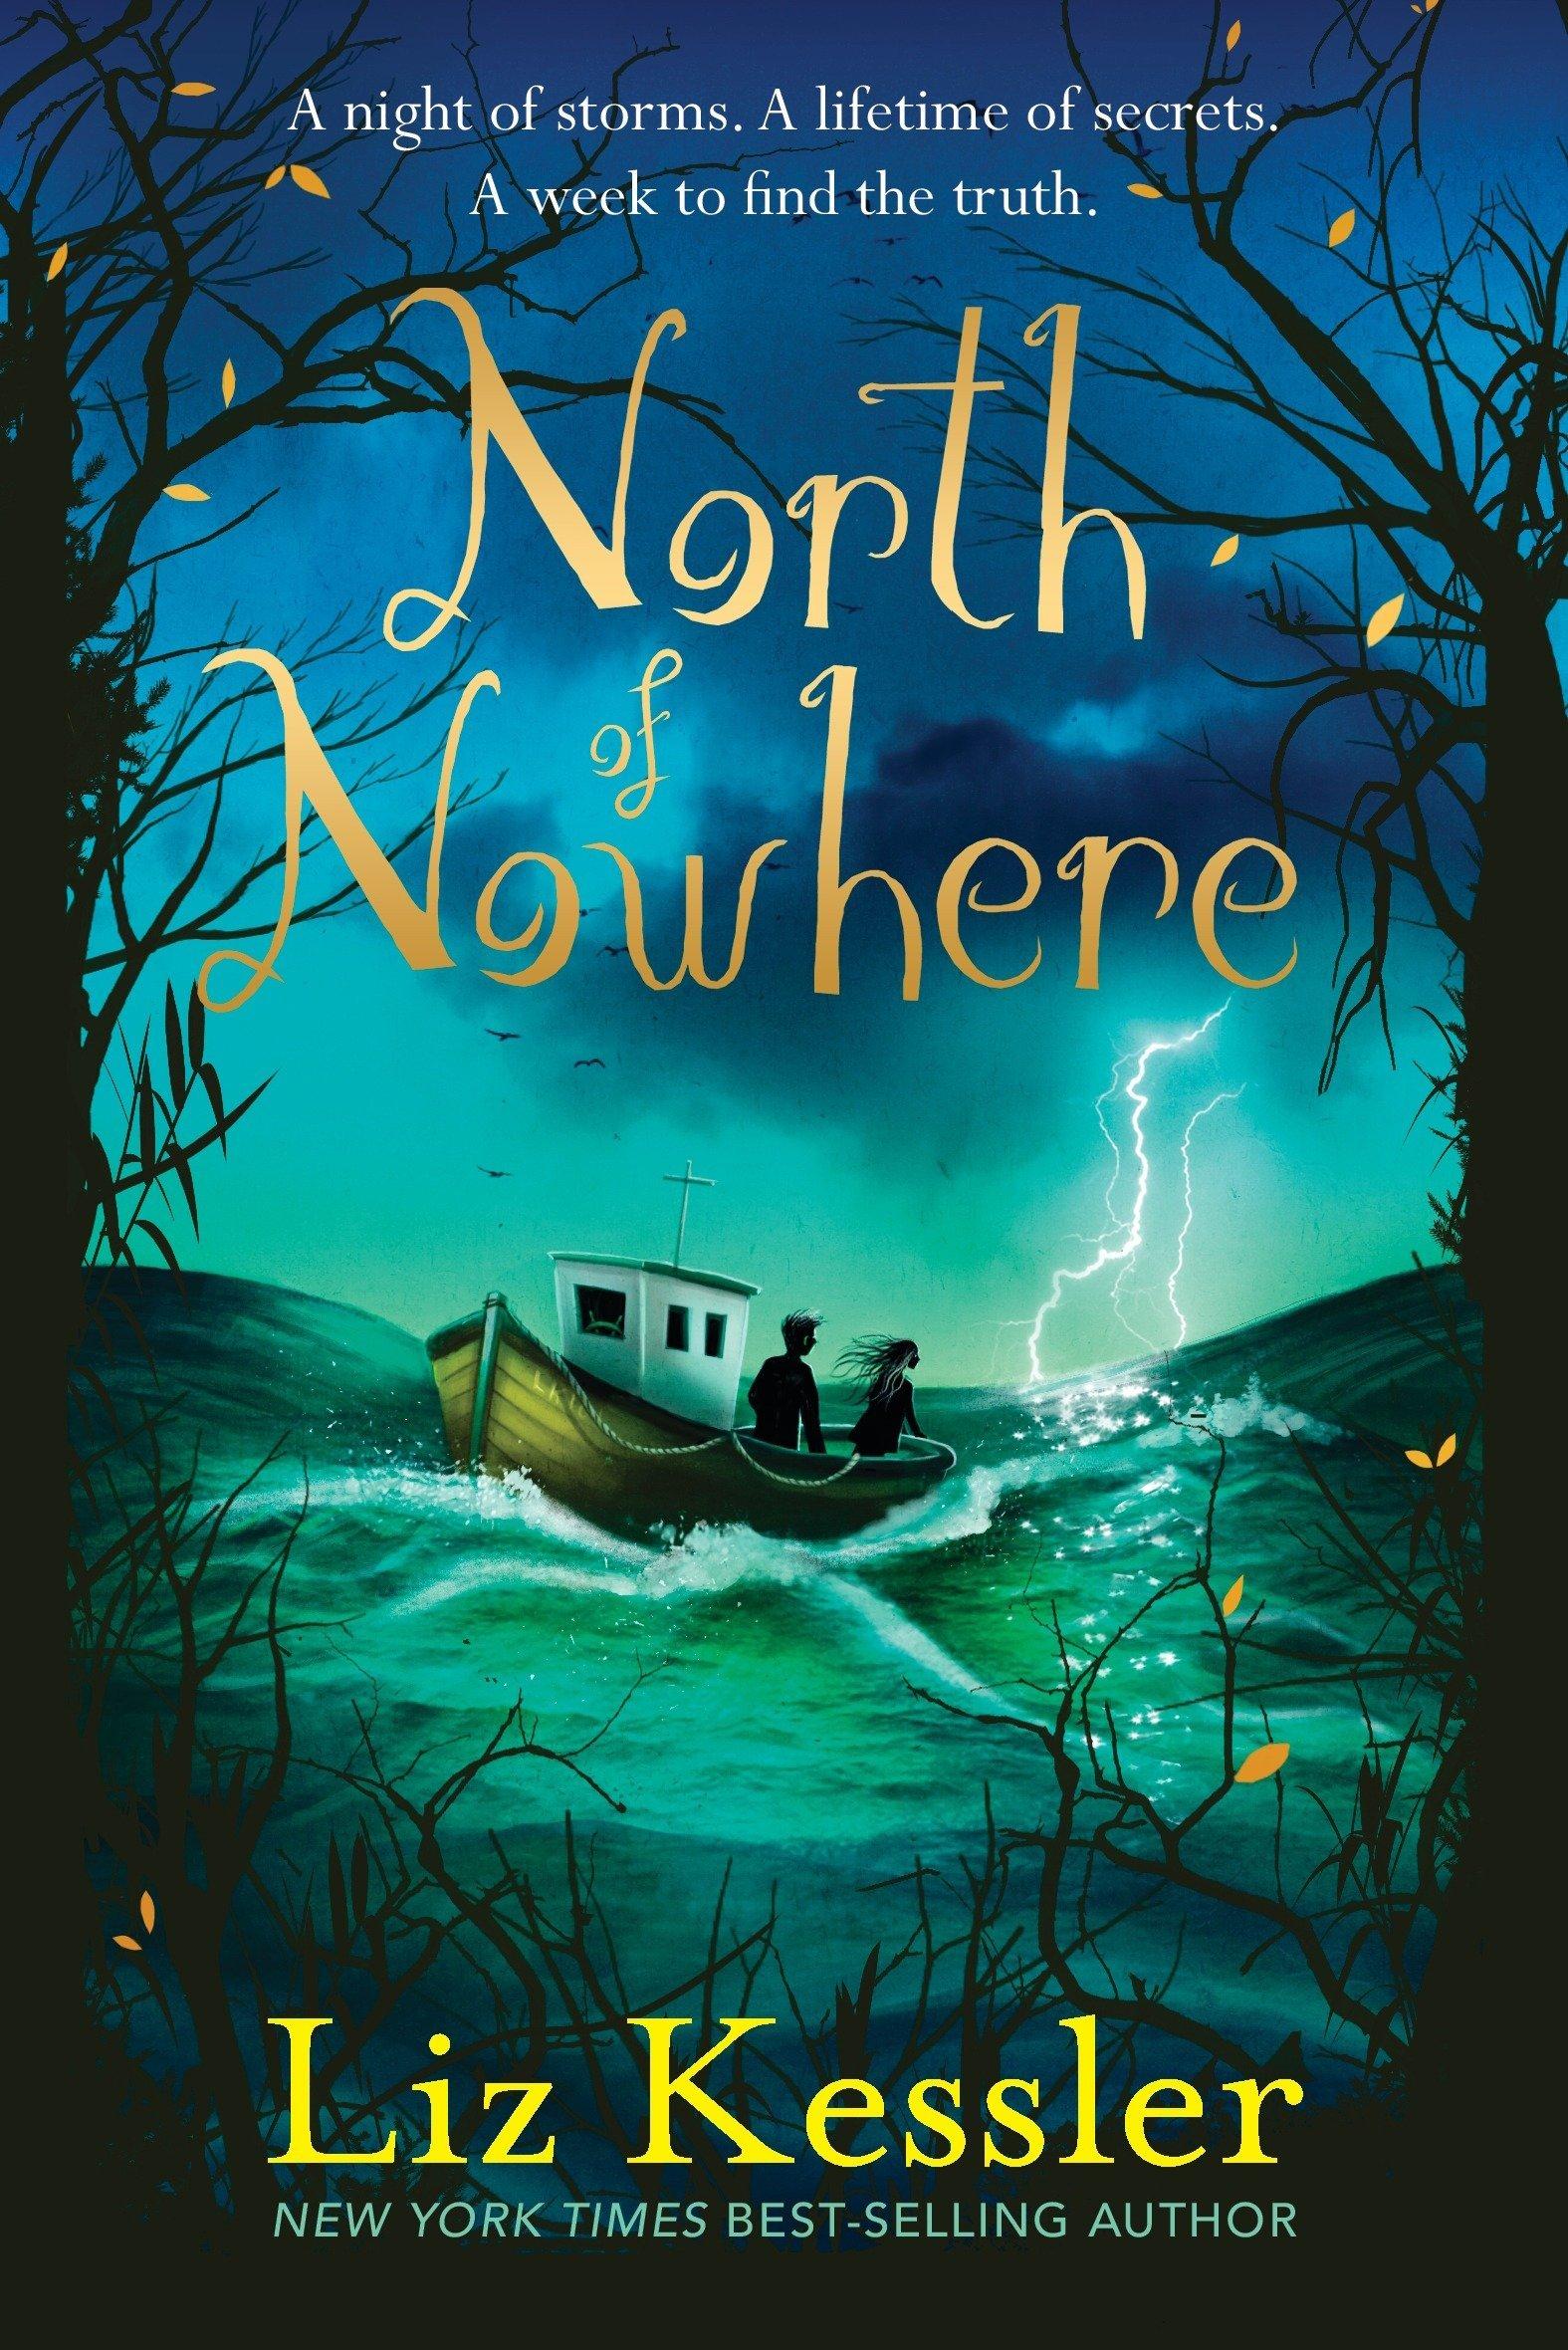 North of Nowhere: Kessler, Liz: 9780763667276: Amazon.com: Books